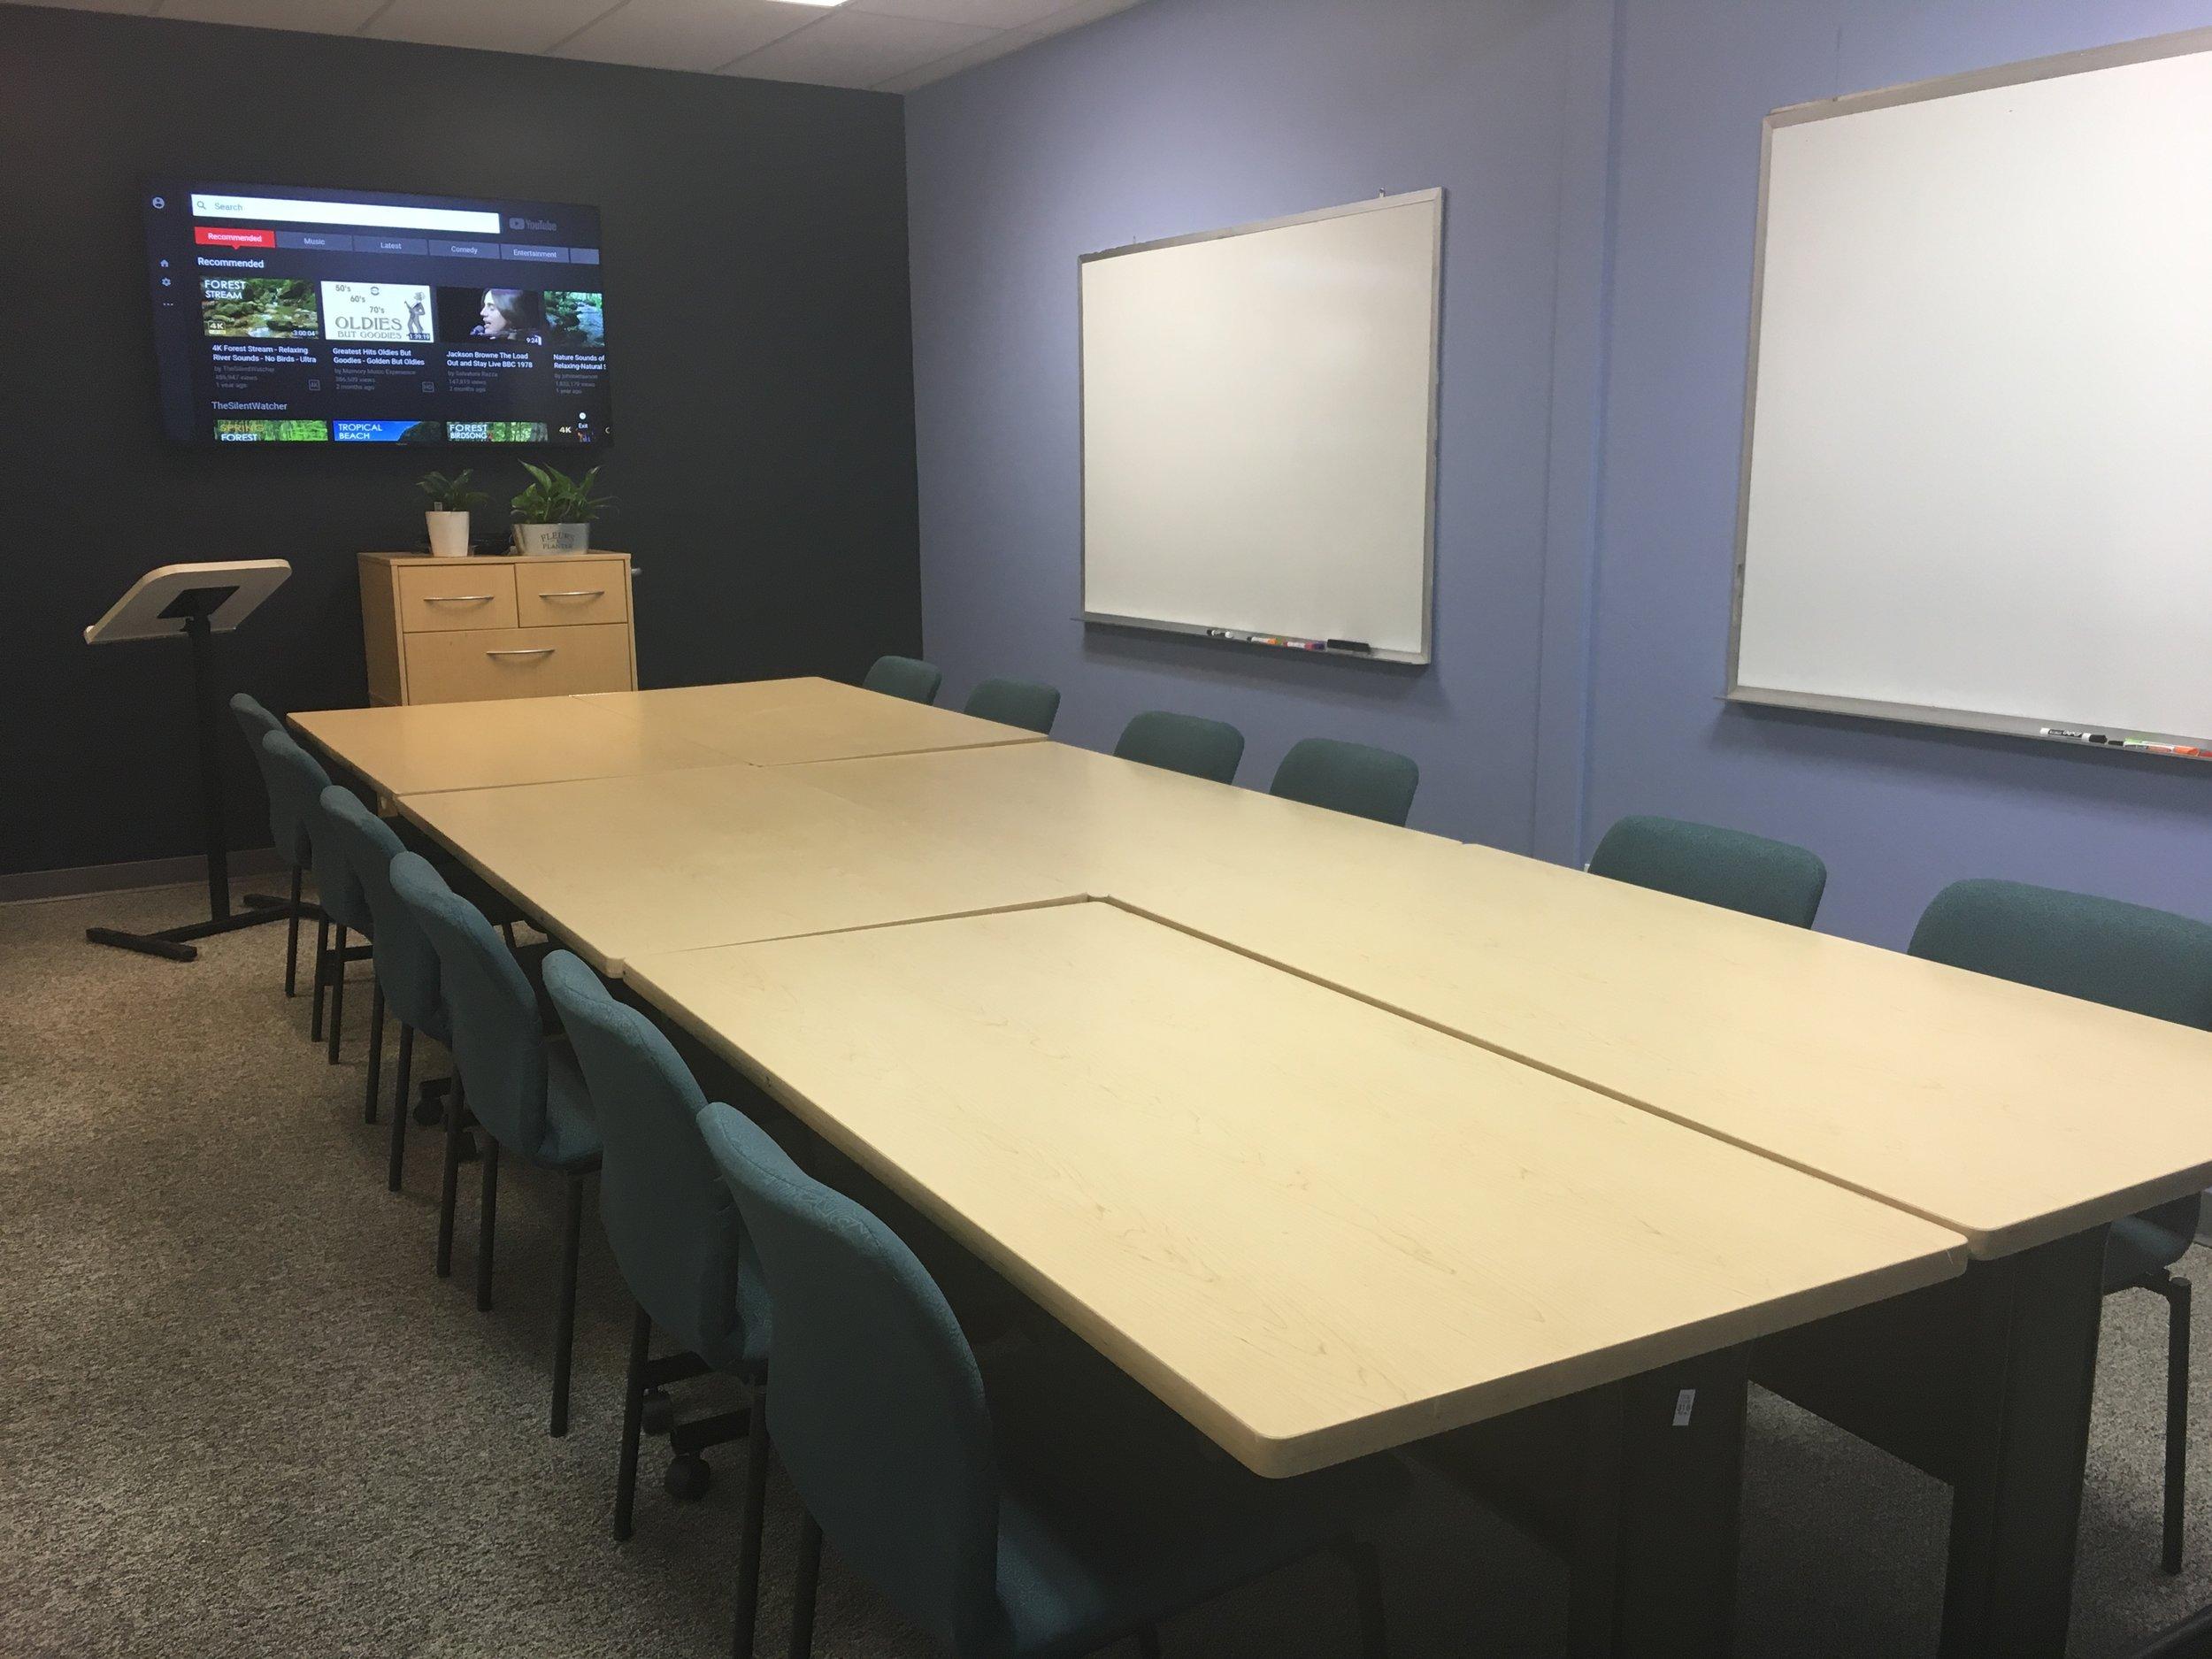 constellation conference room.JPG